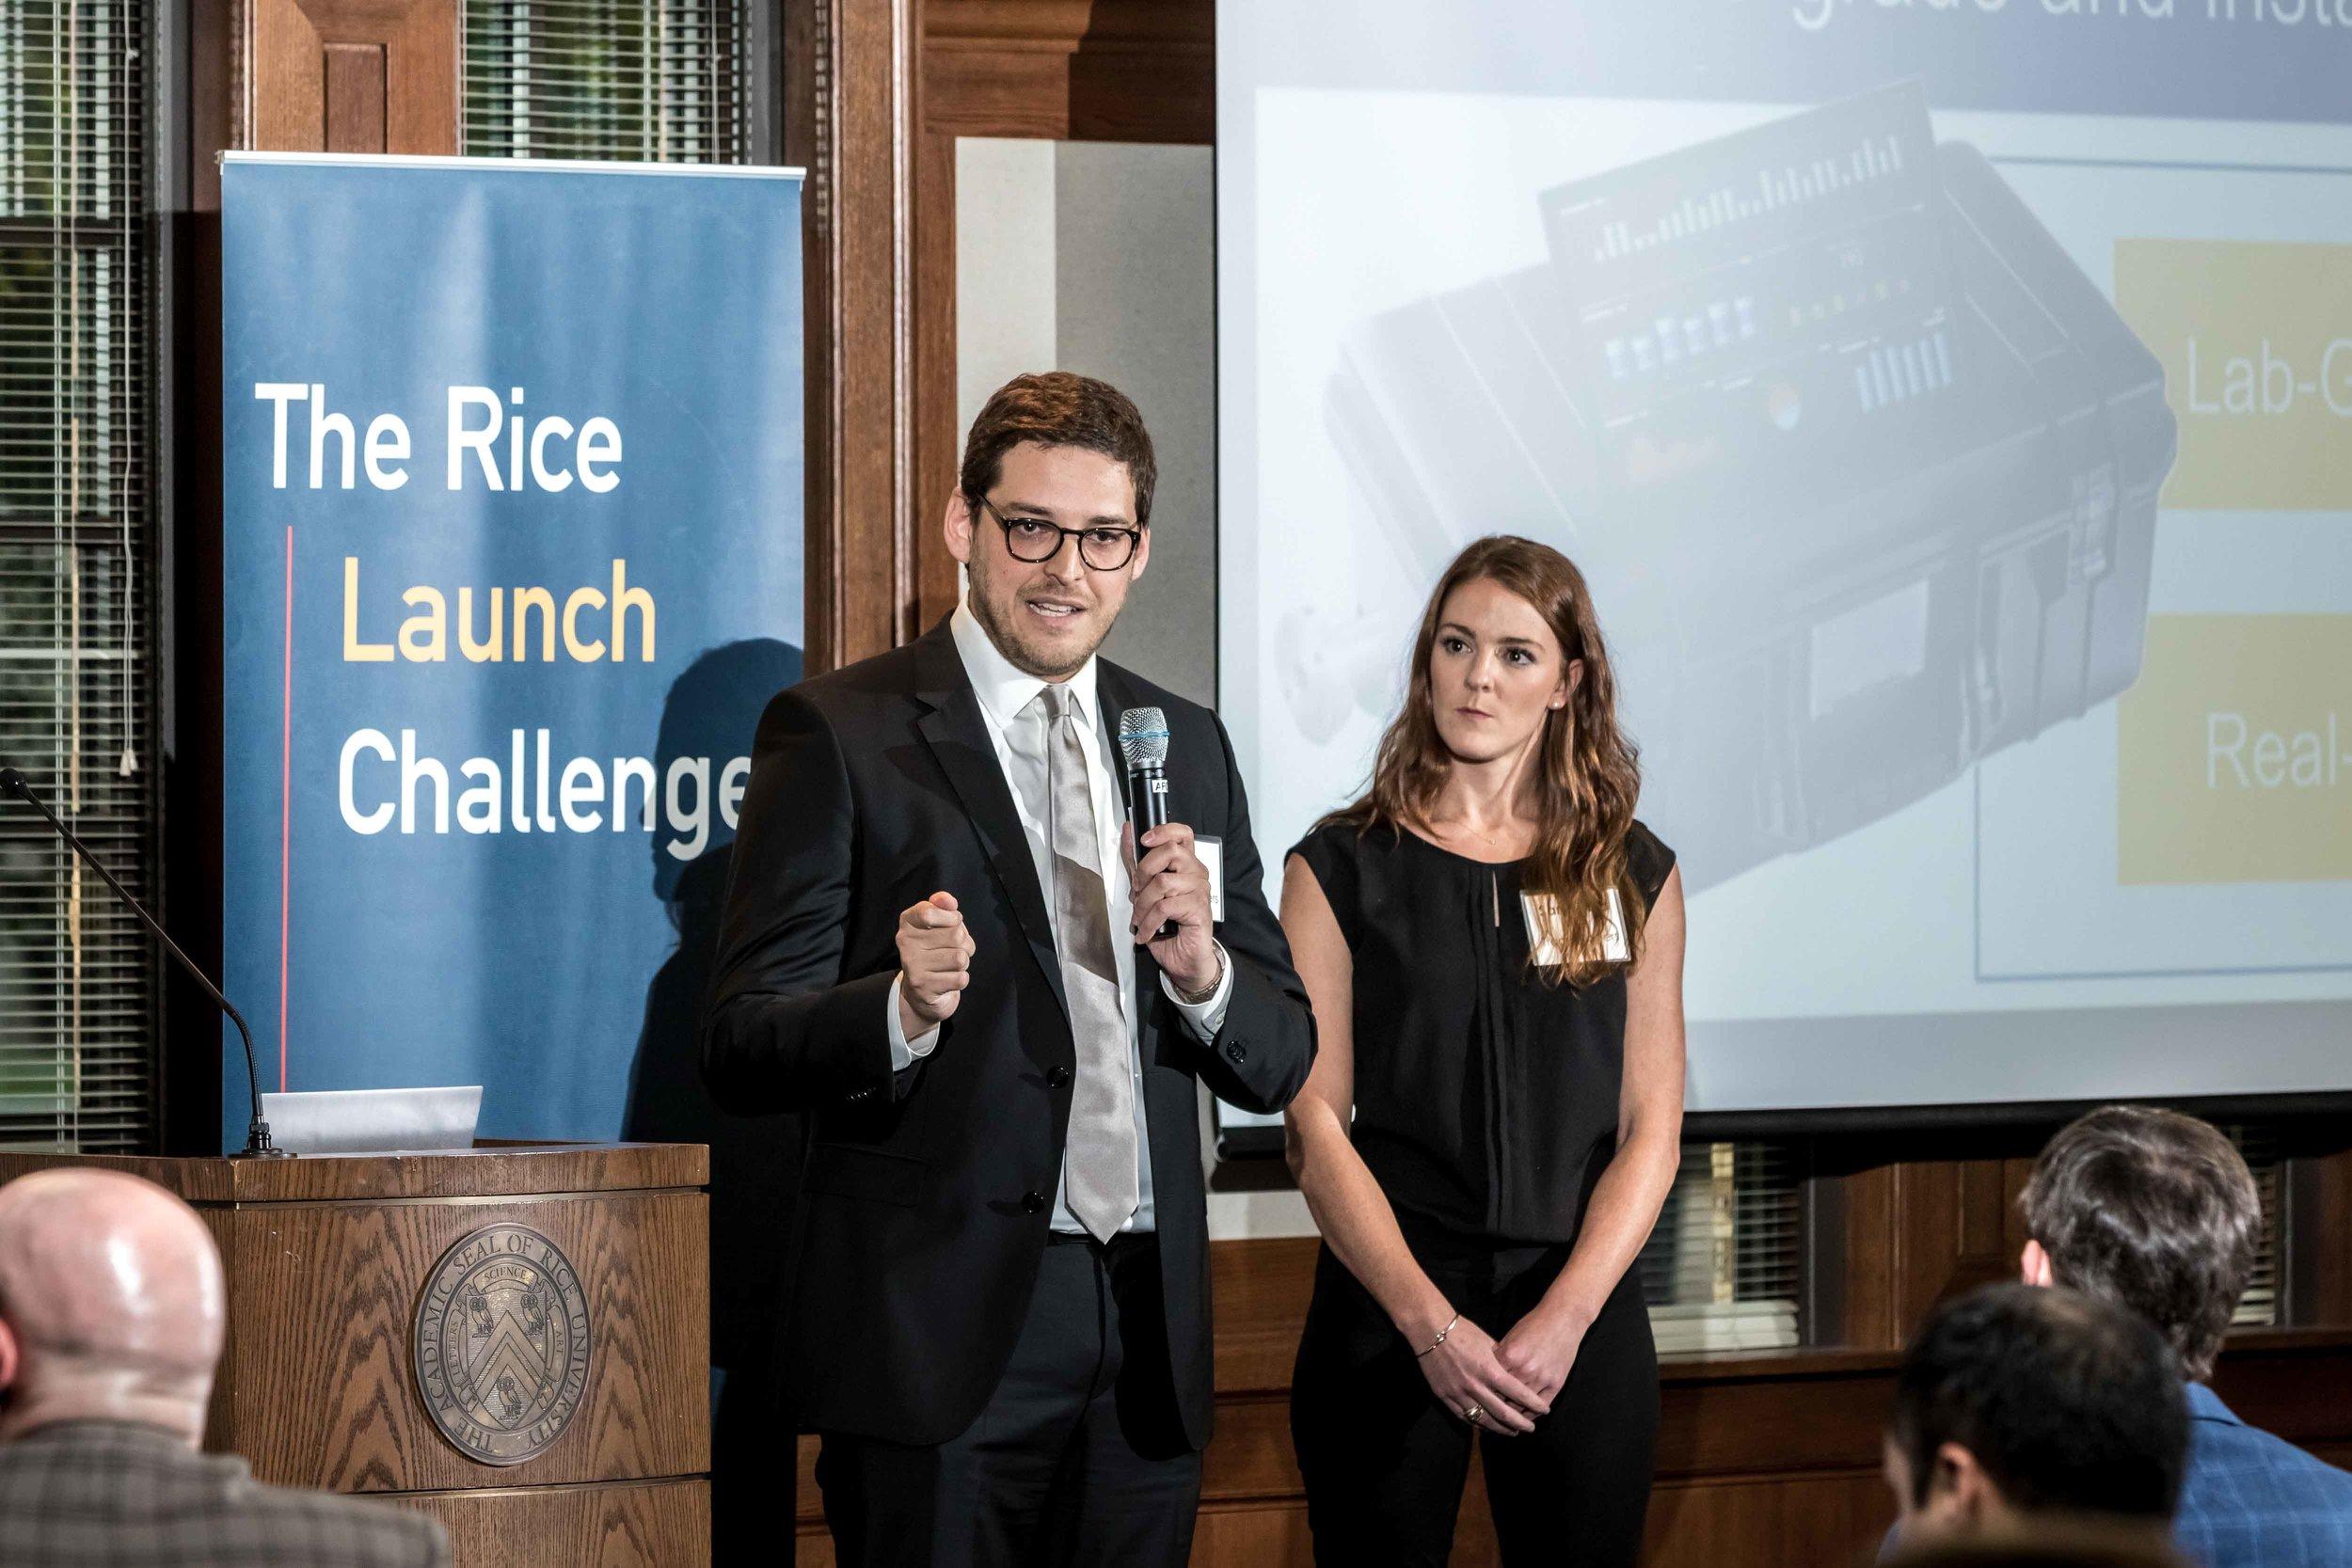 Rice University - Launch Challenge 29Mar2017-42Rice University - Launch Challenge 29Mar2017.JPG